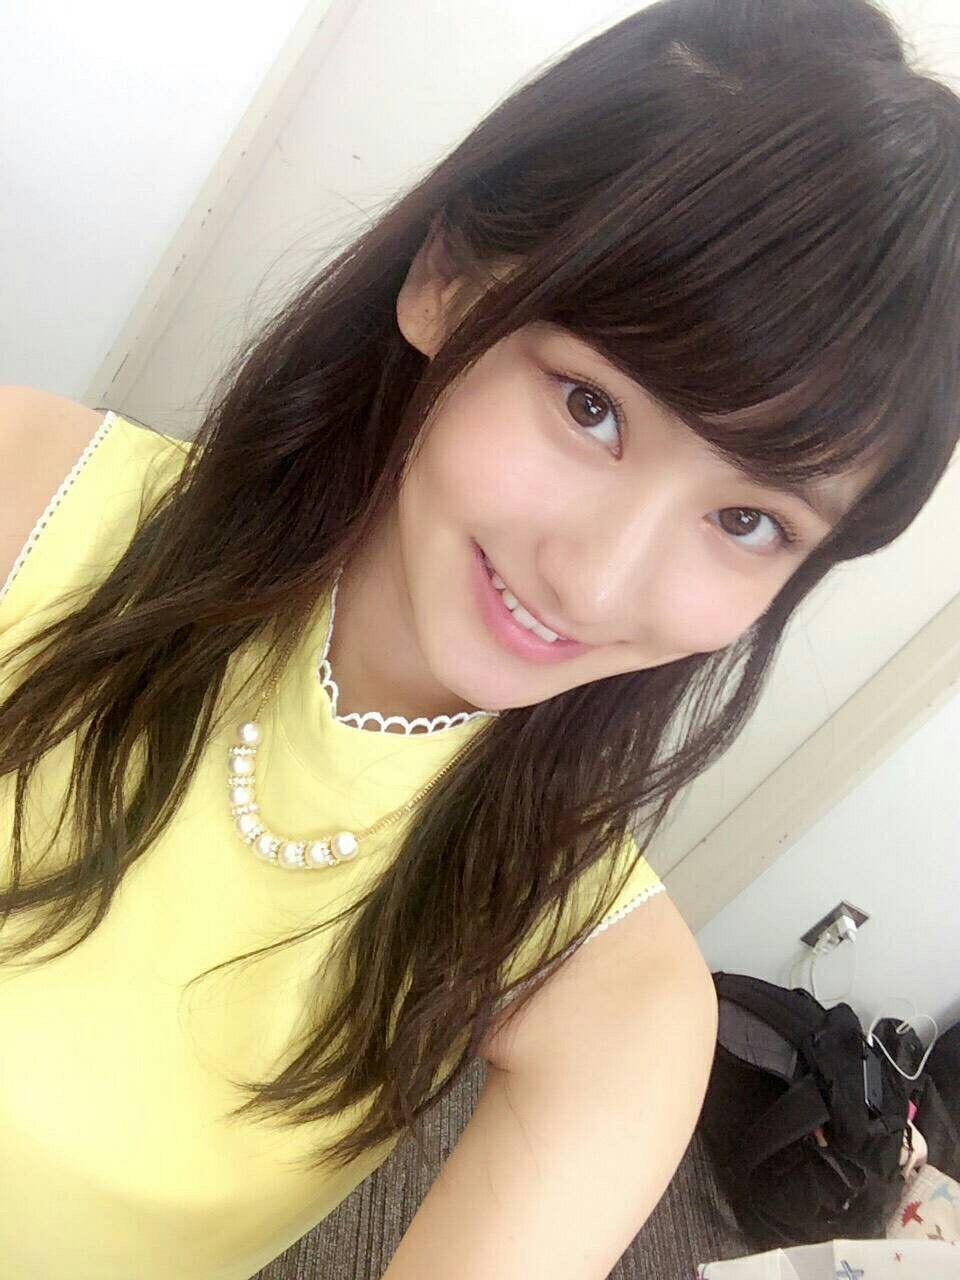 girls delta 3500-071 jp.mp4jpg.icu